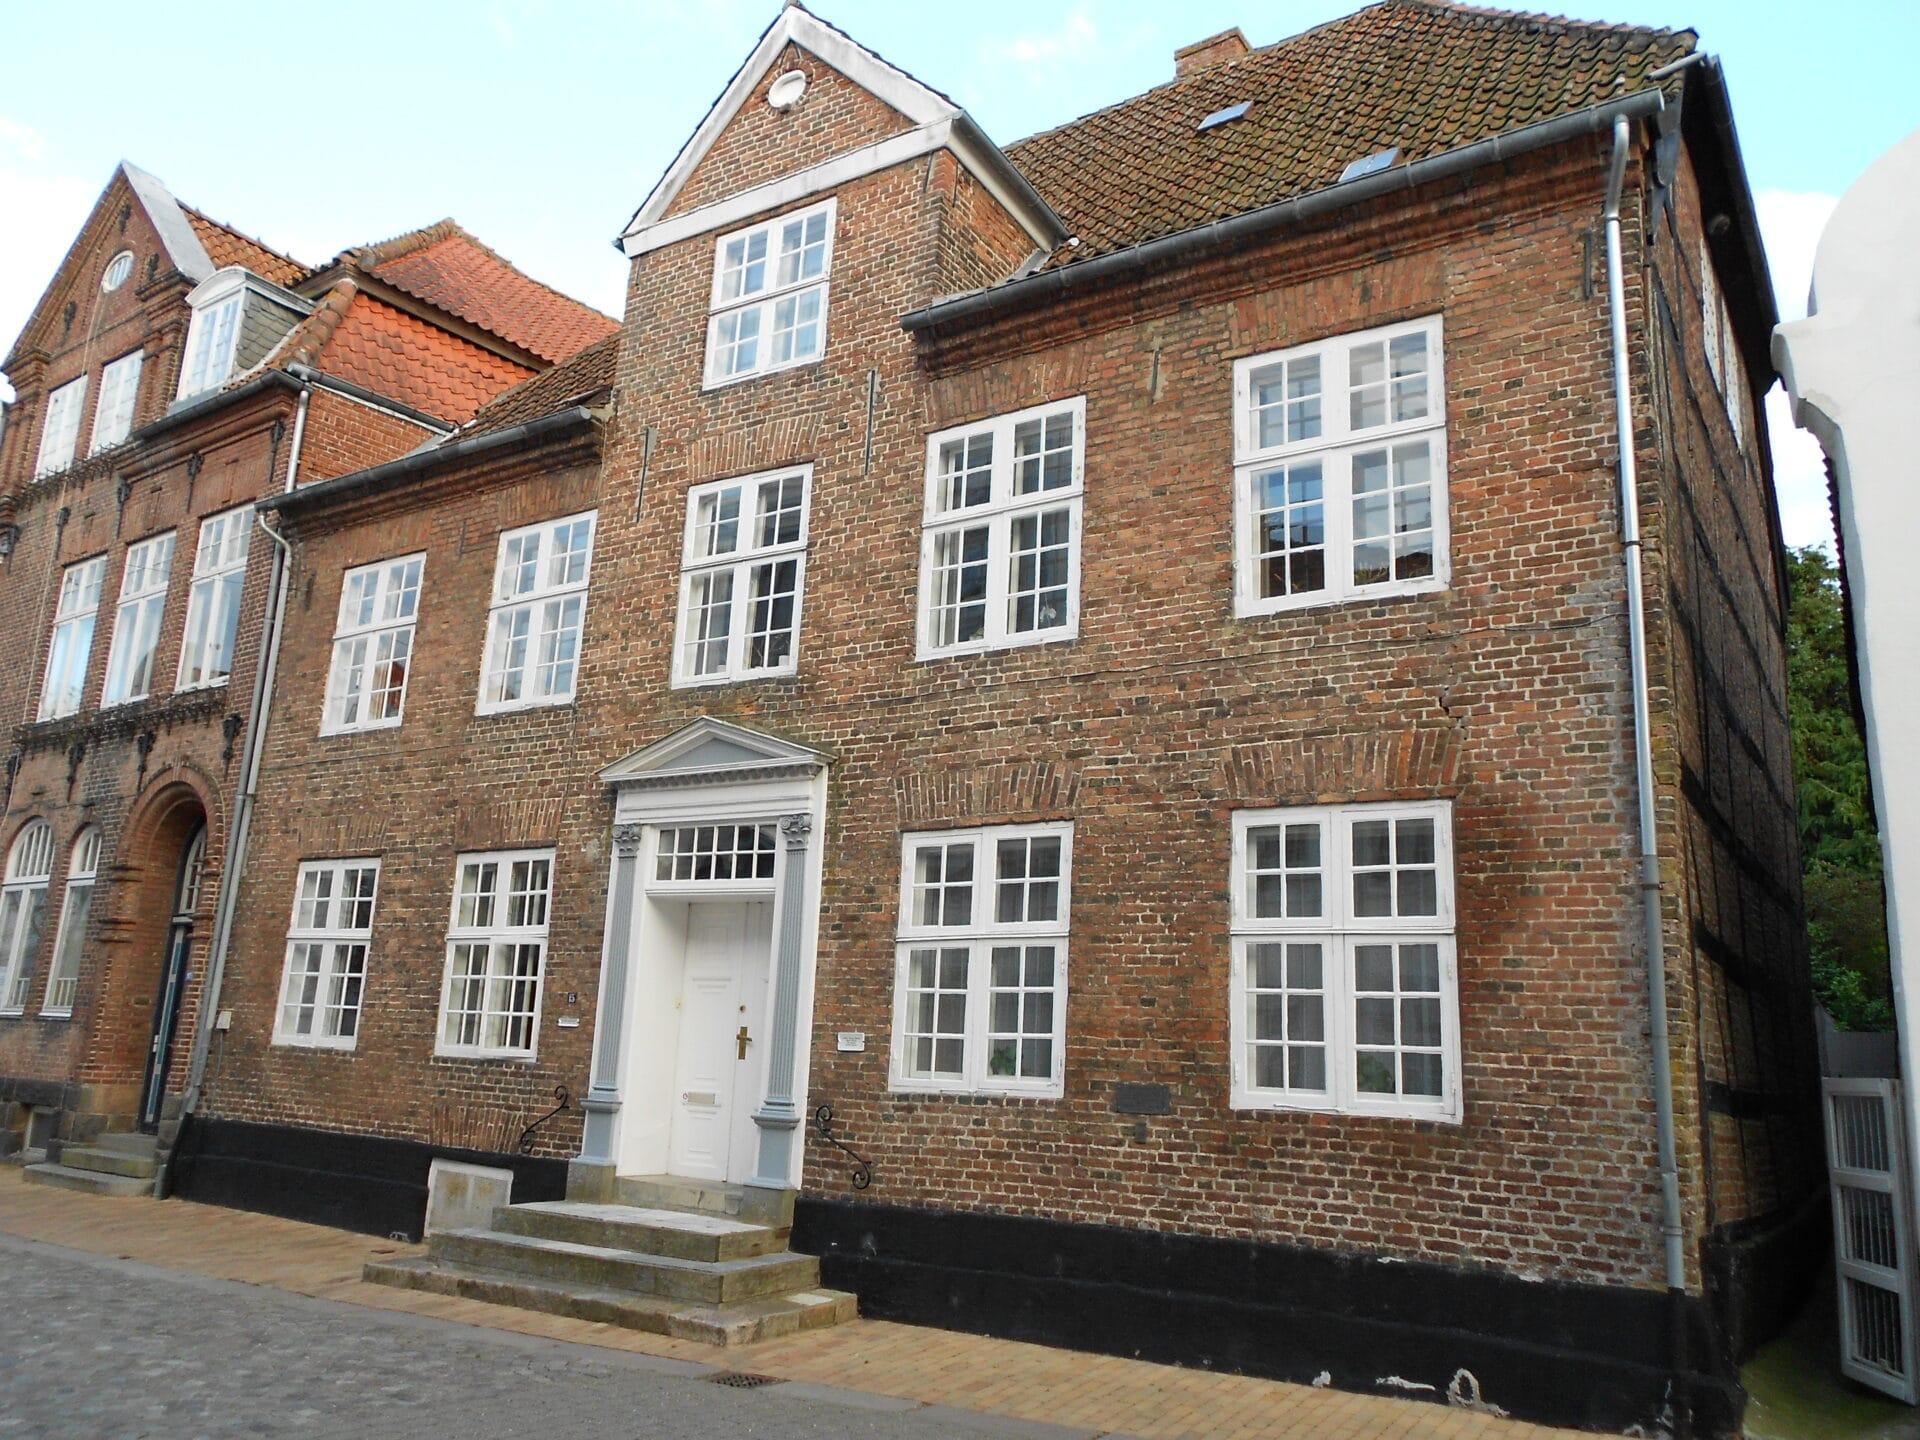 Bürgermeister Sibbers Haus